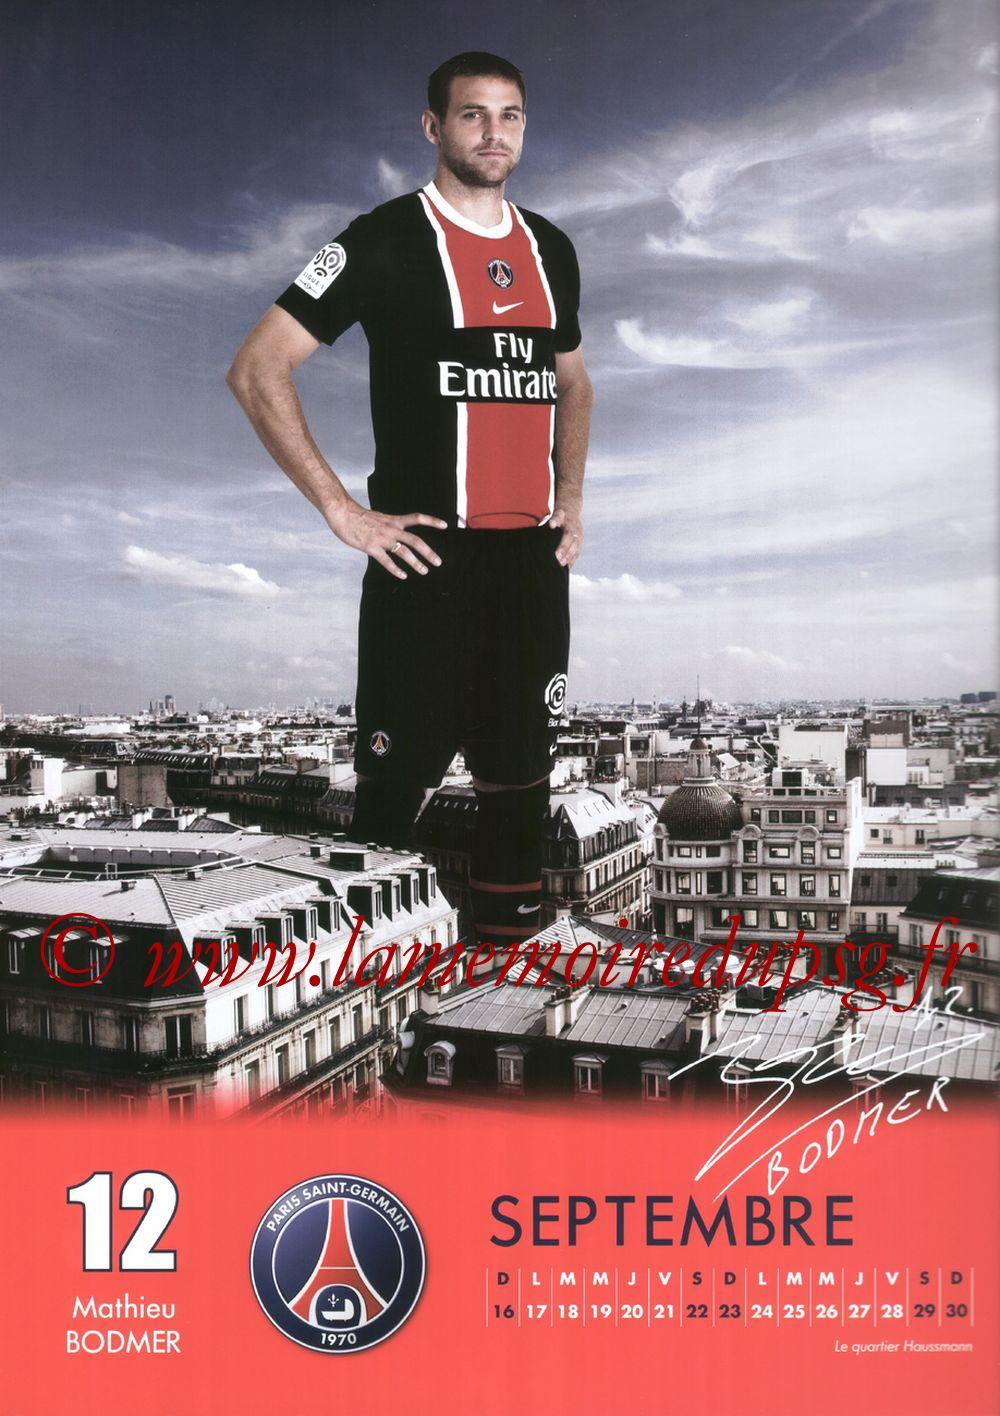 Calendrier PSG 2012 - Page 18 - Mathieu BODMER